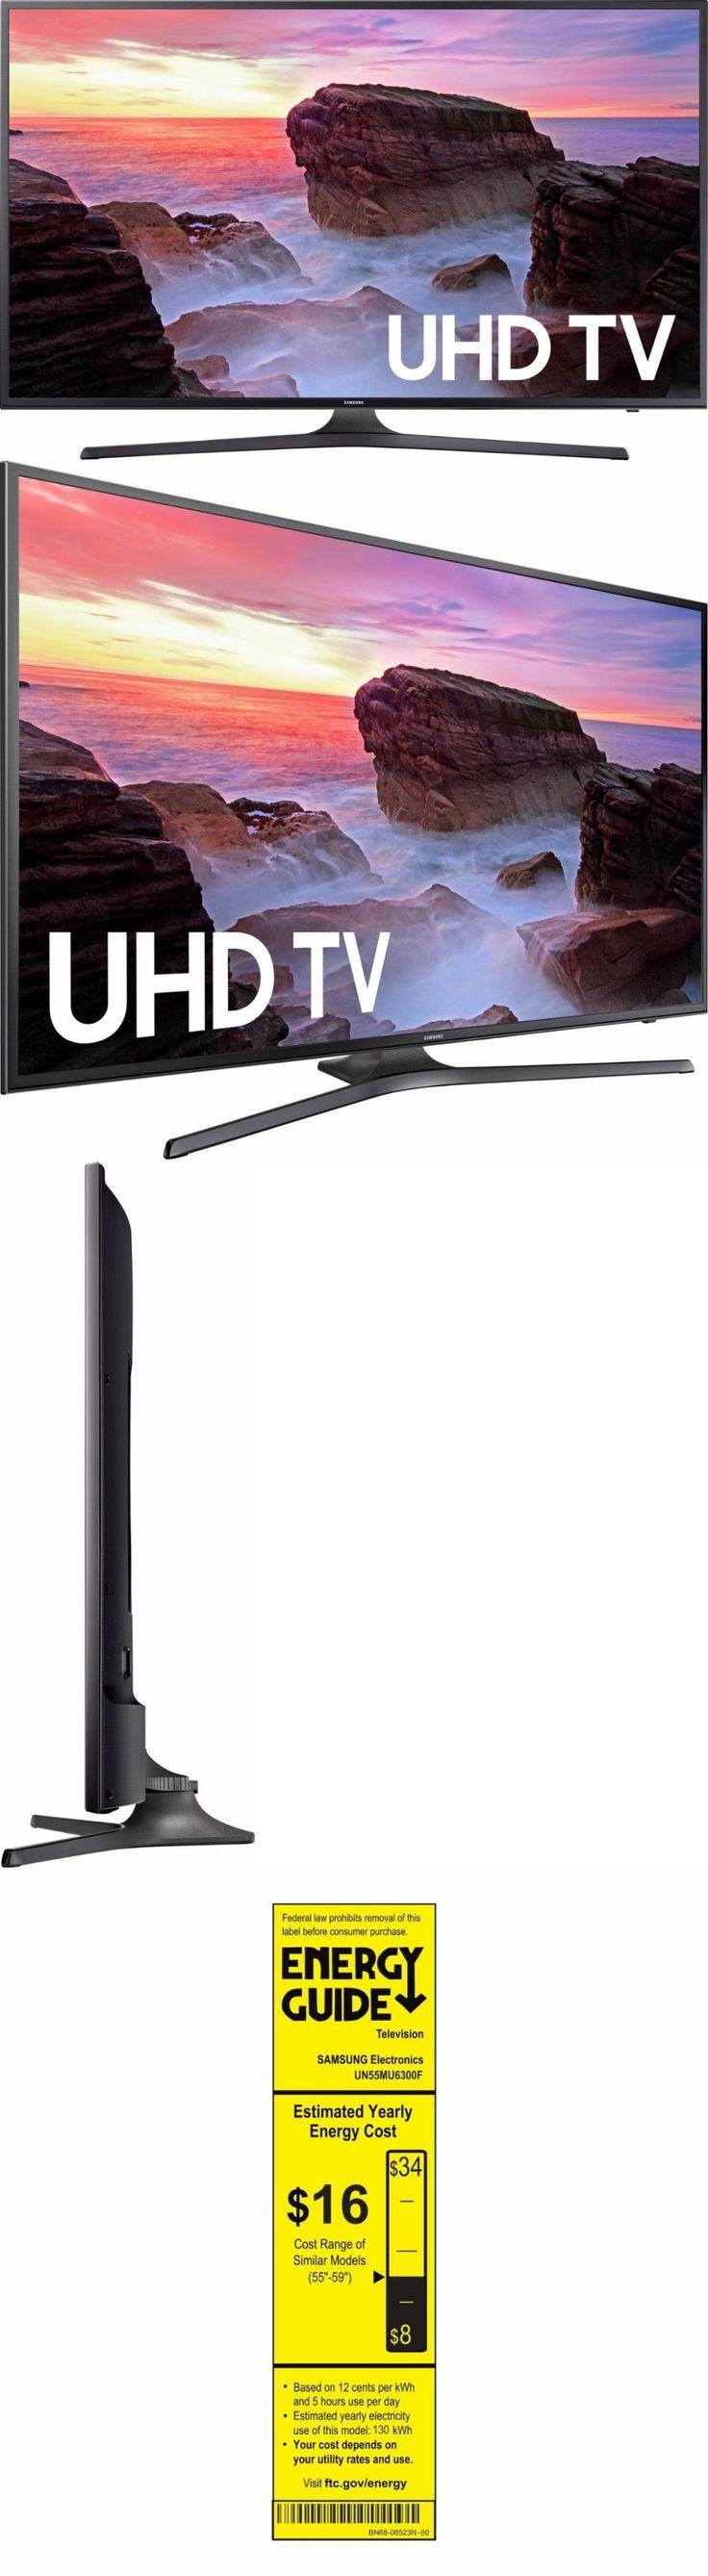 Televisions: Samsung 55 Inch 4K Ultra Hd Smart Tv Un55mu6300f Uhd Tv Brand New -> BUY IT NOW ONLY: $637.95 on eBay!